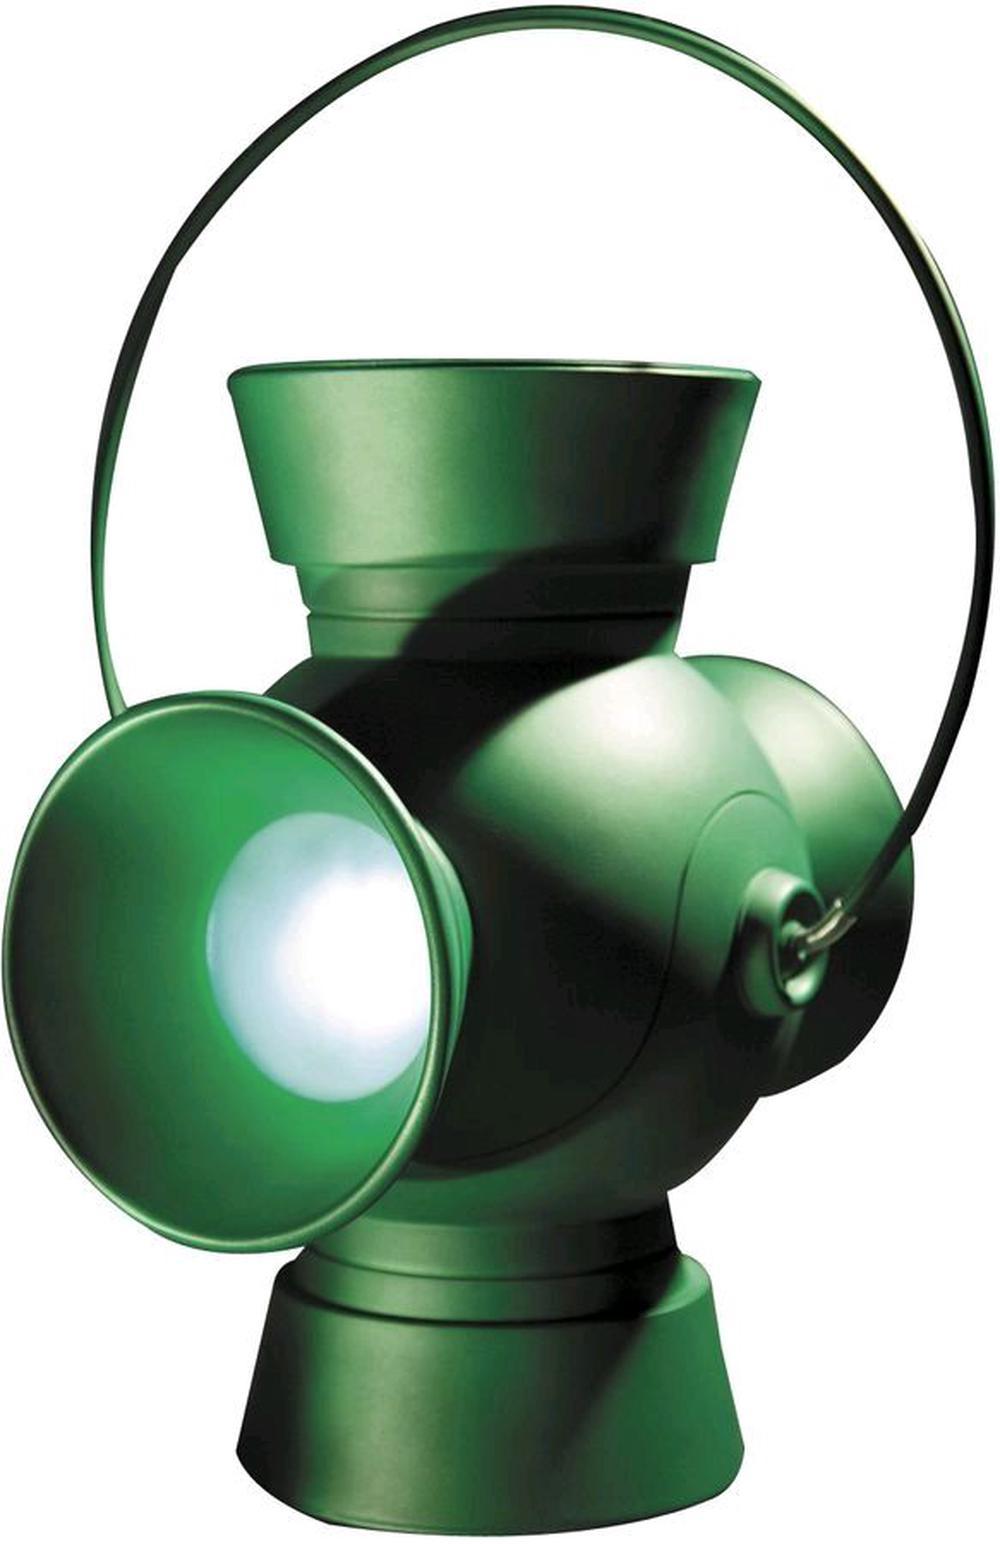 DC Comics Green Lantern - Green Power Battery 1:1 Scale Replica